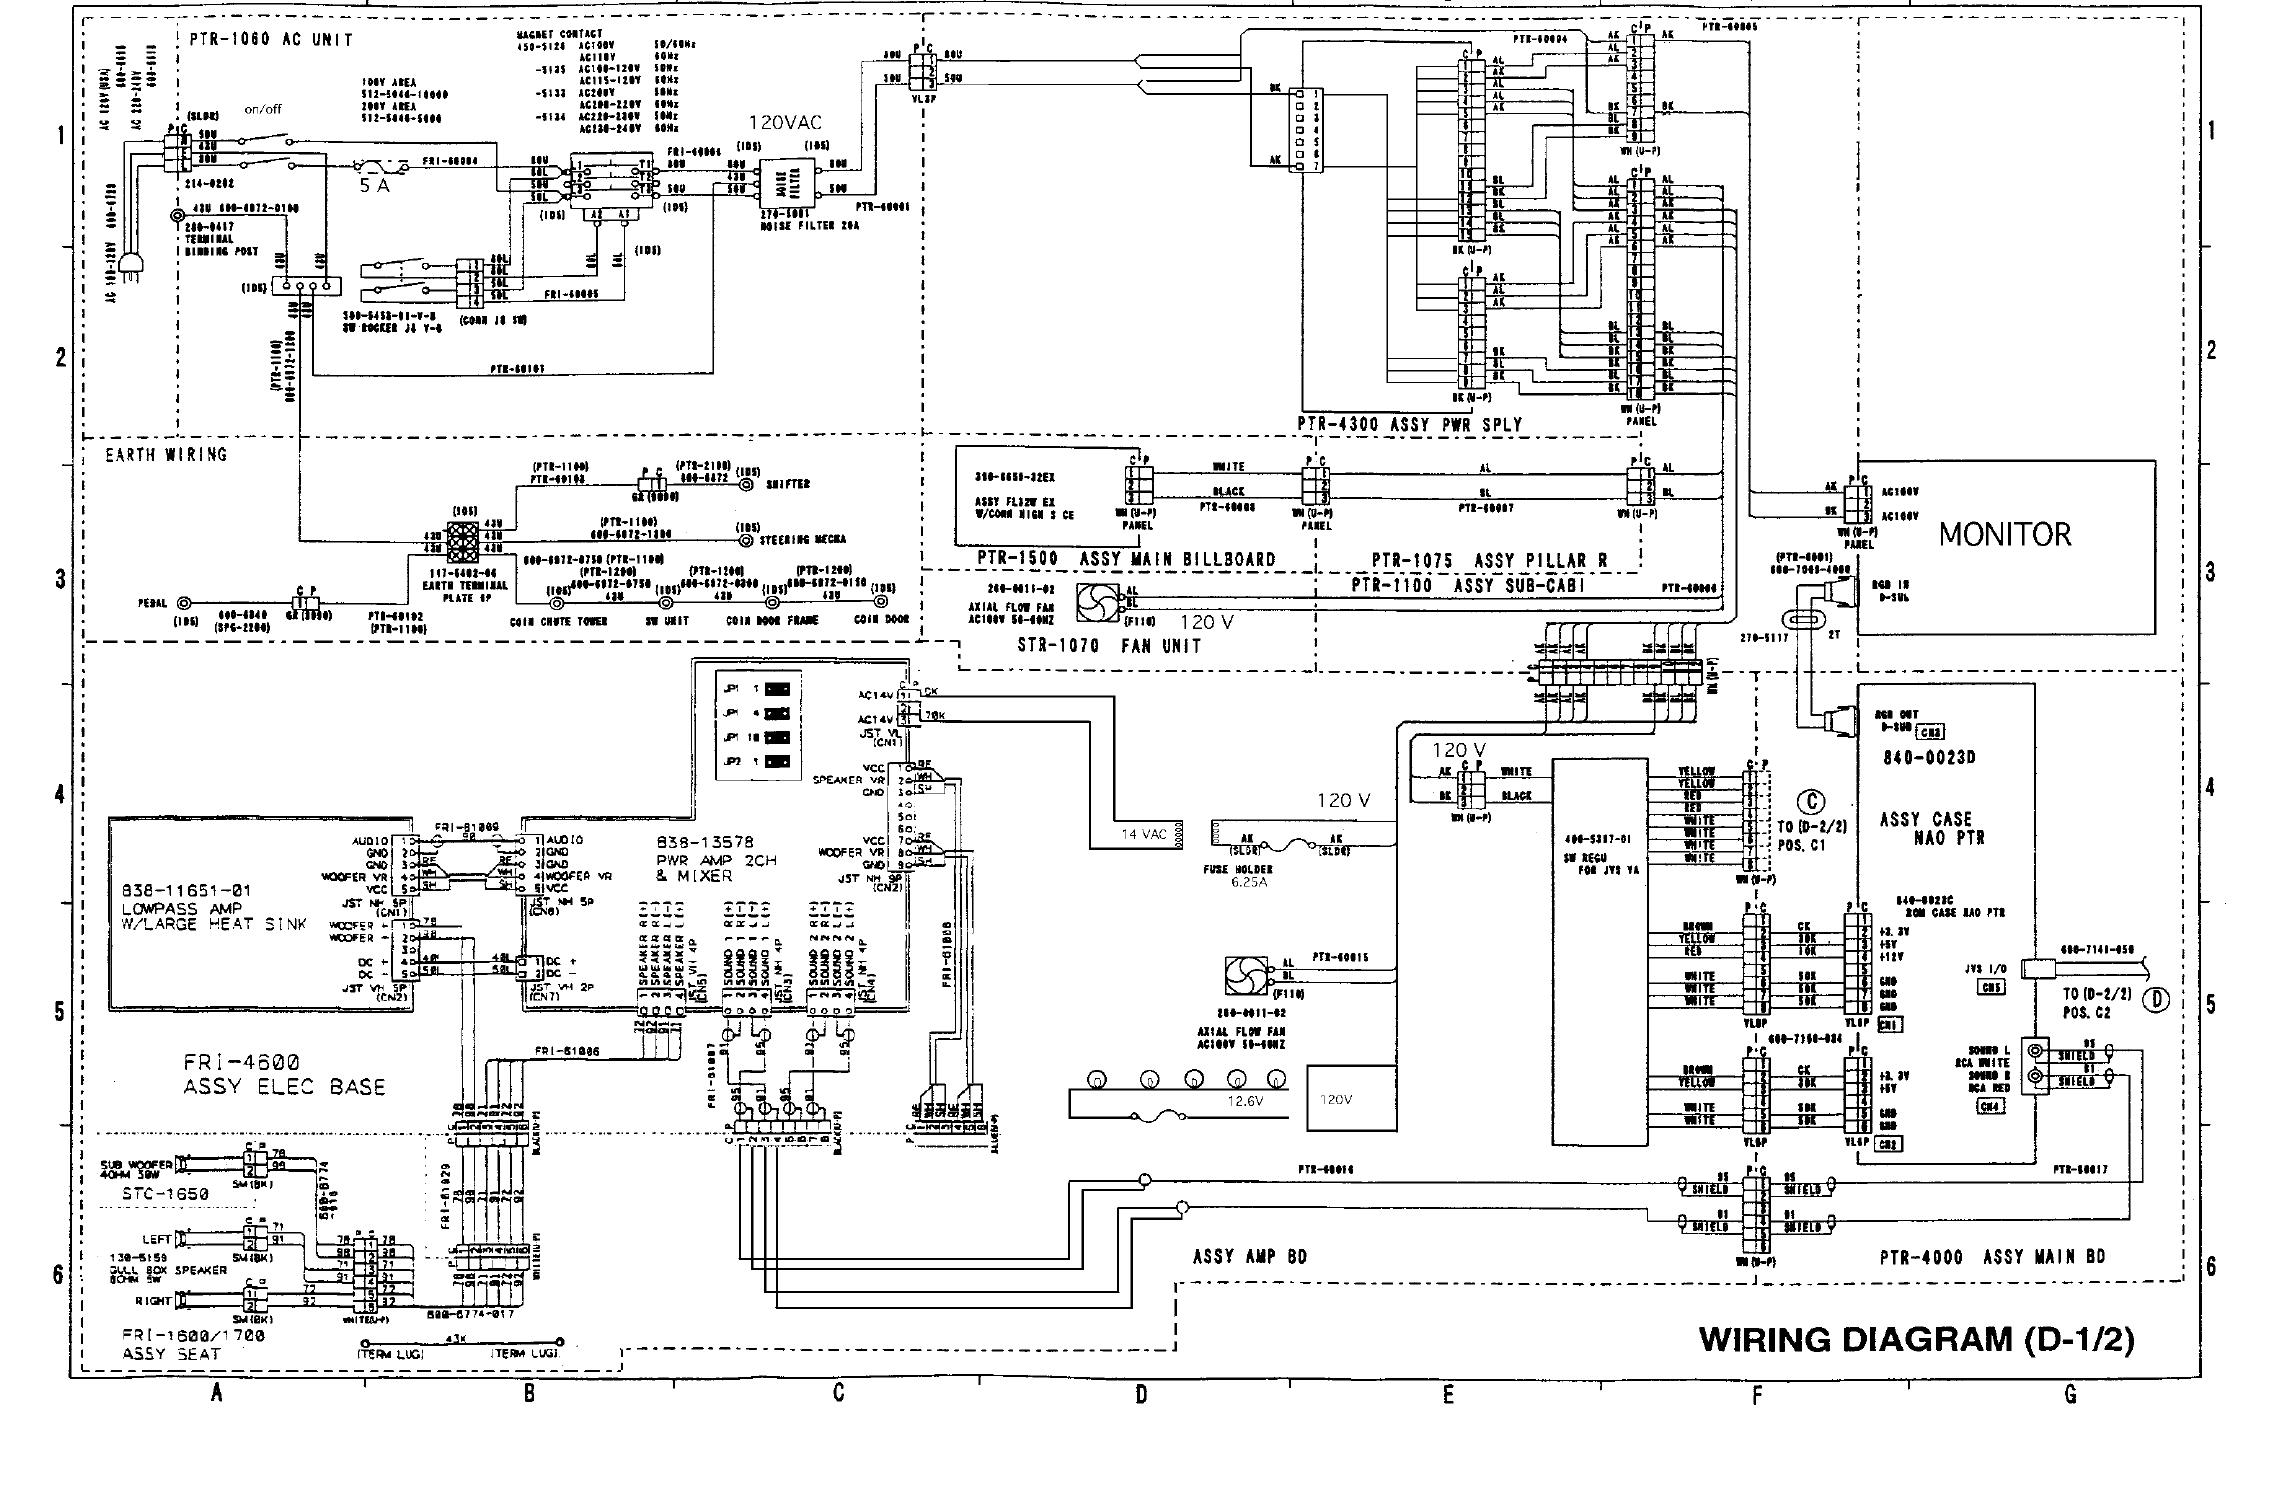 wd18wstd1 18 wheeler std wiring diagrams Auto Gauge Wiring